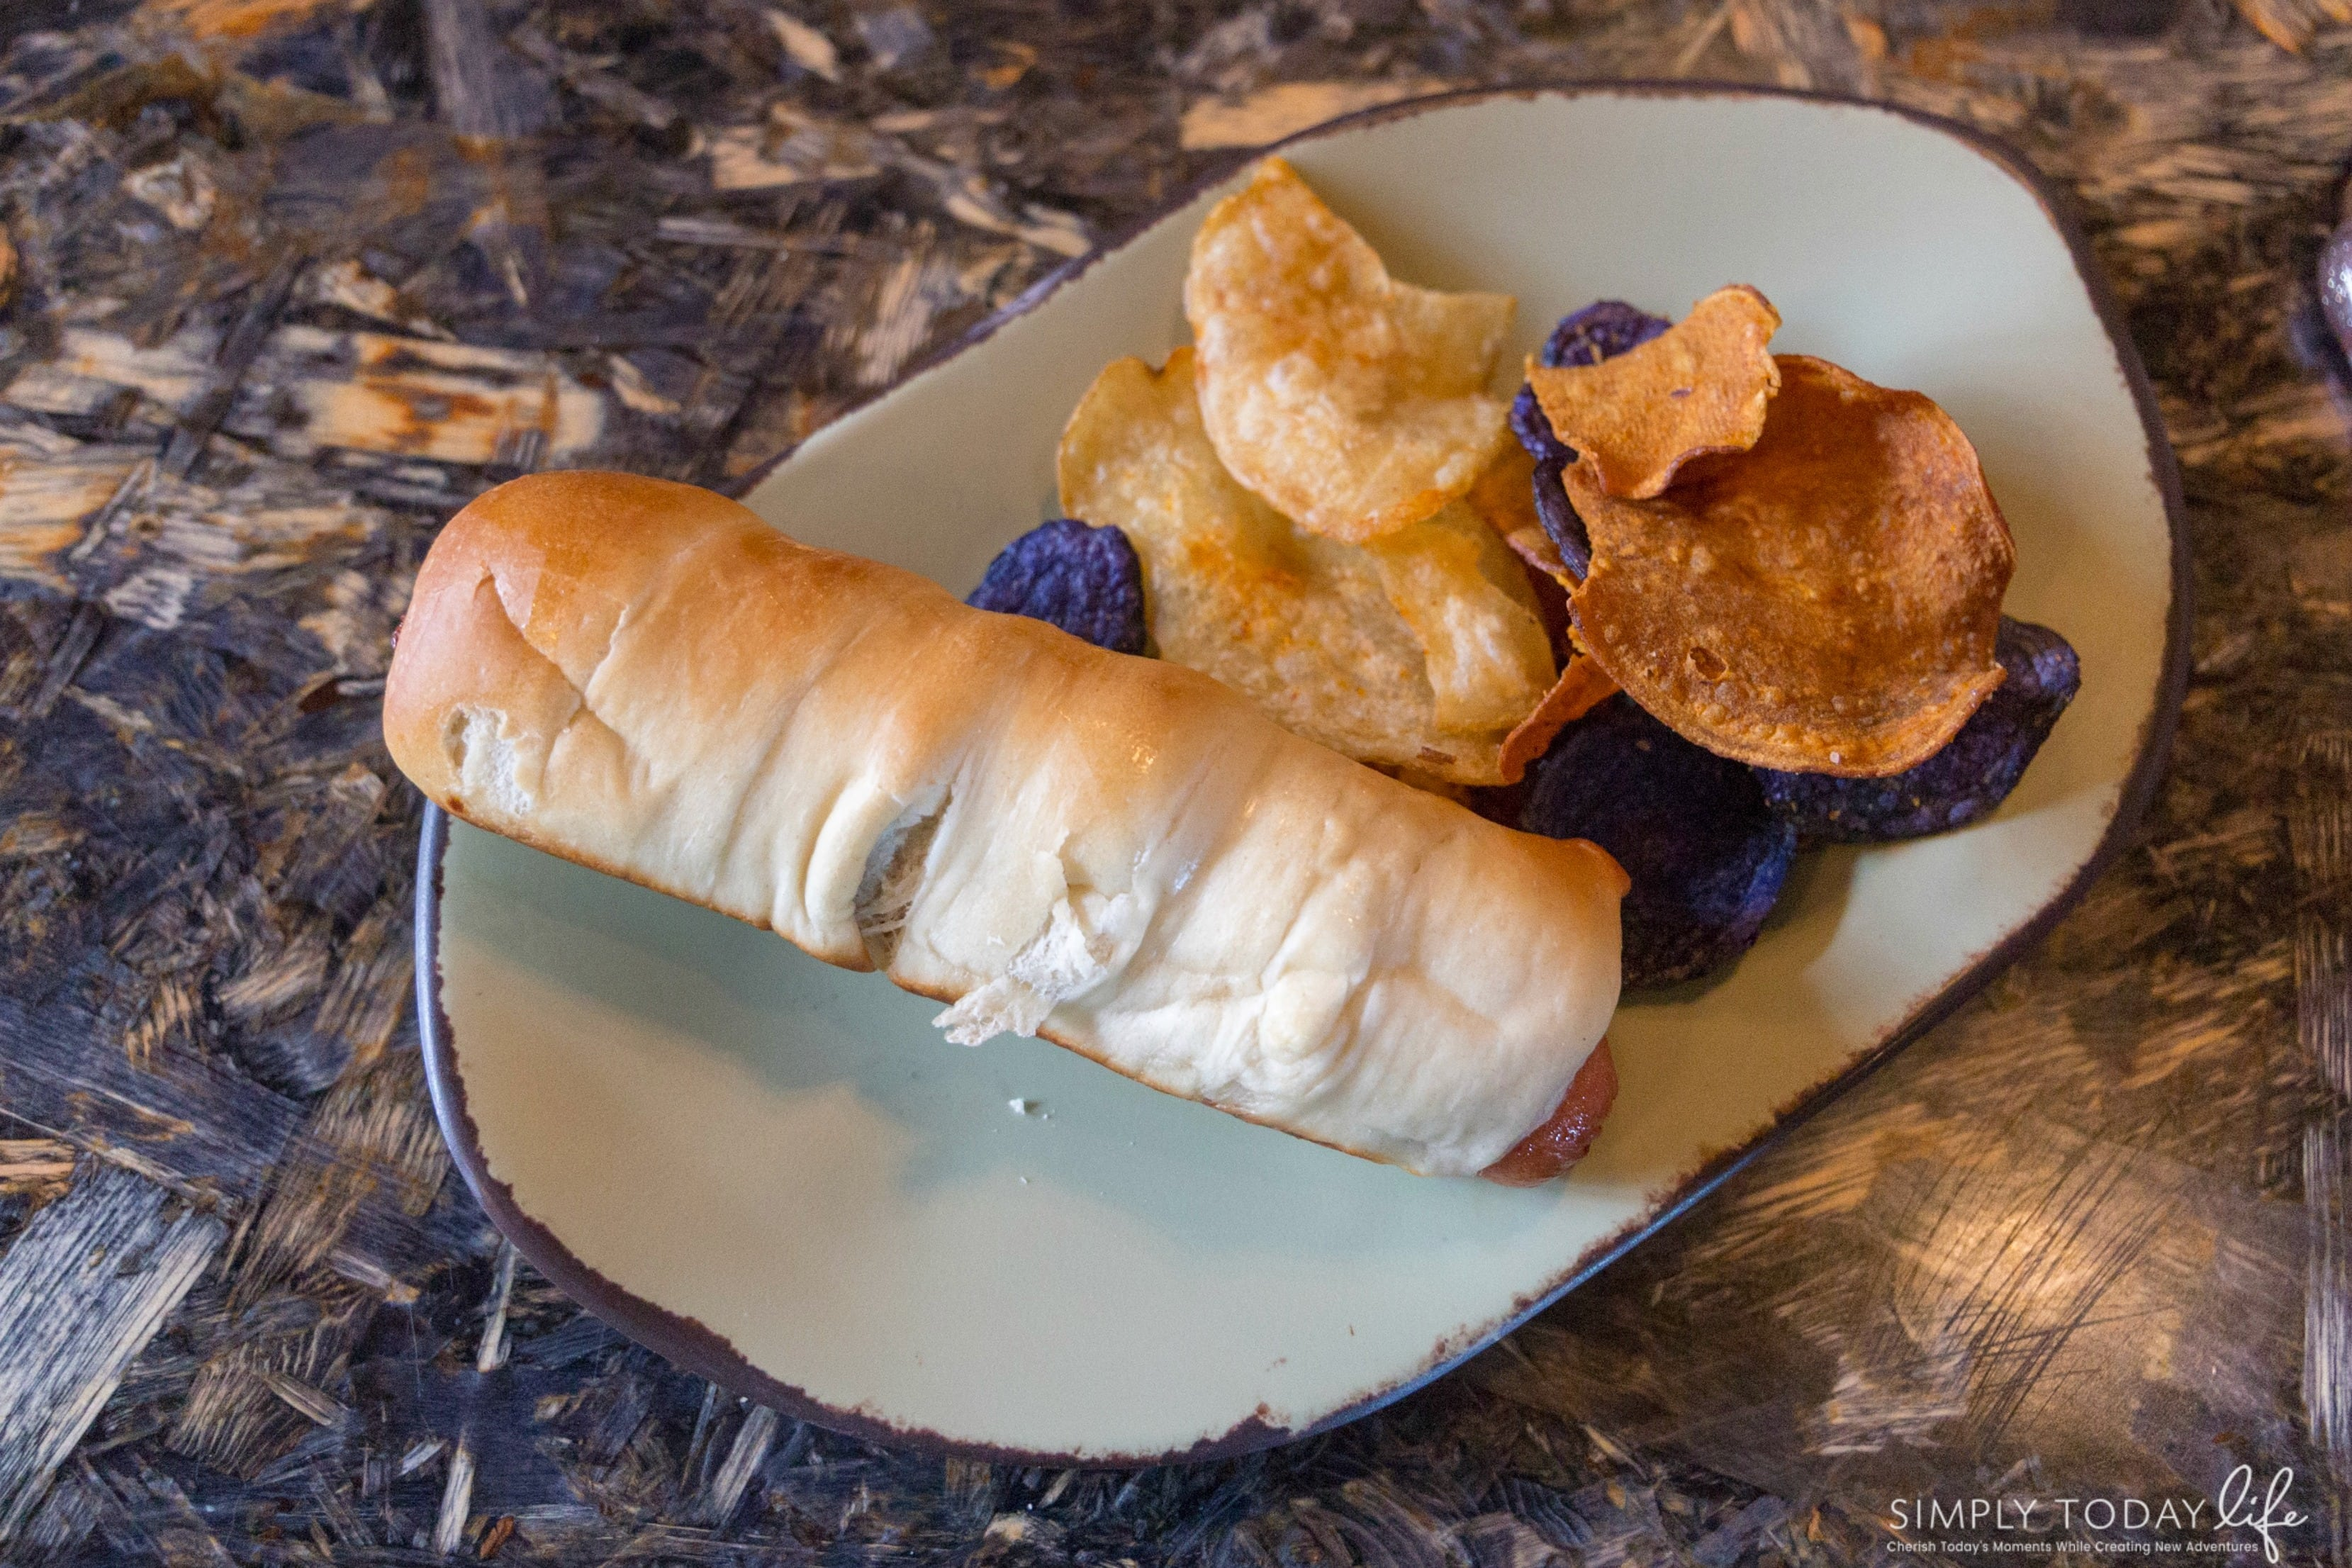 Satu'li Canteen Kids Meal Teylu All Beef Hot Dog - simplytodalife.com